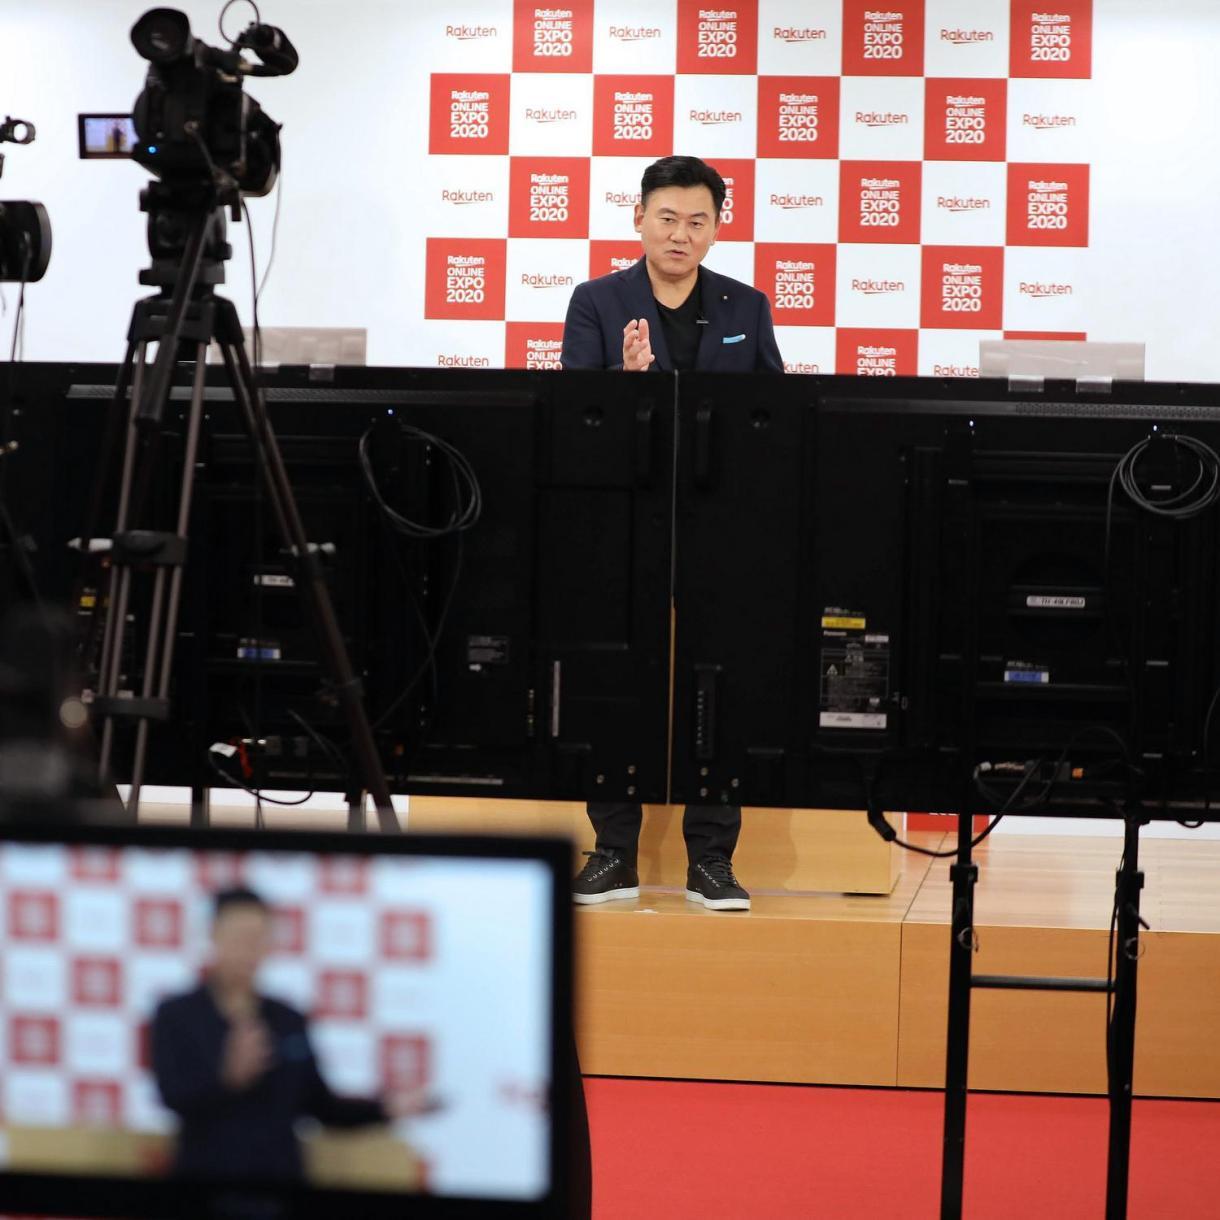 Rakuten Chairman and CEO Mickey Mikitani delivers his address remotely to the Rakuten Ichiba merchant community.